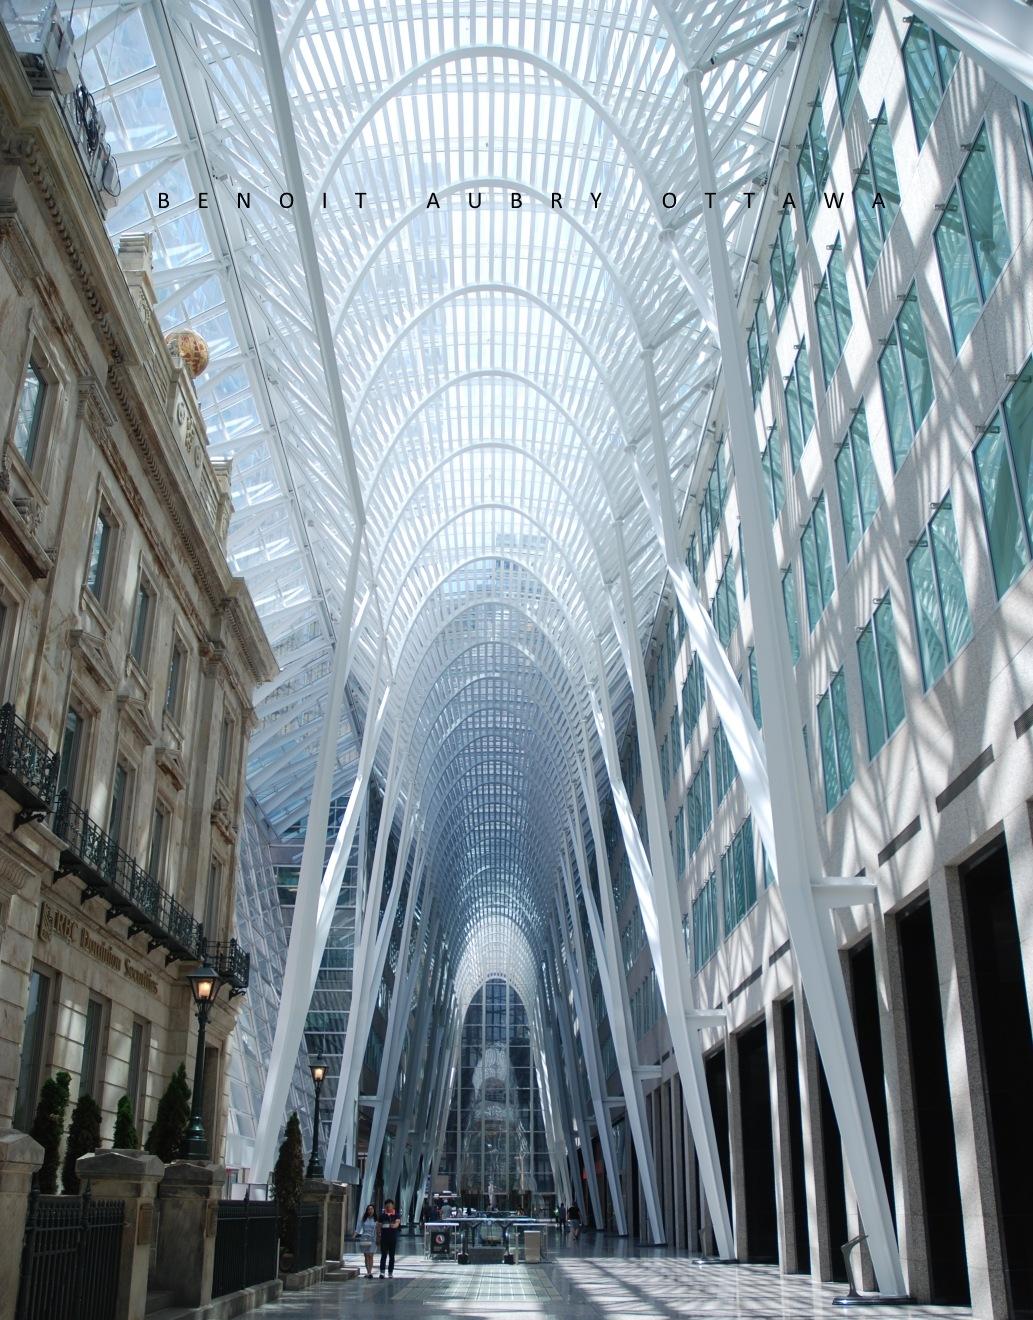 The Mall by Benoit Aubry